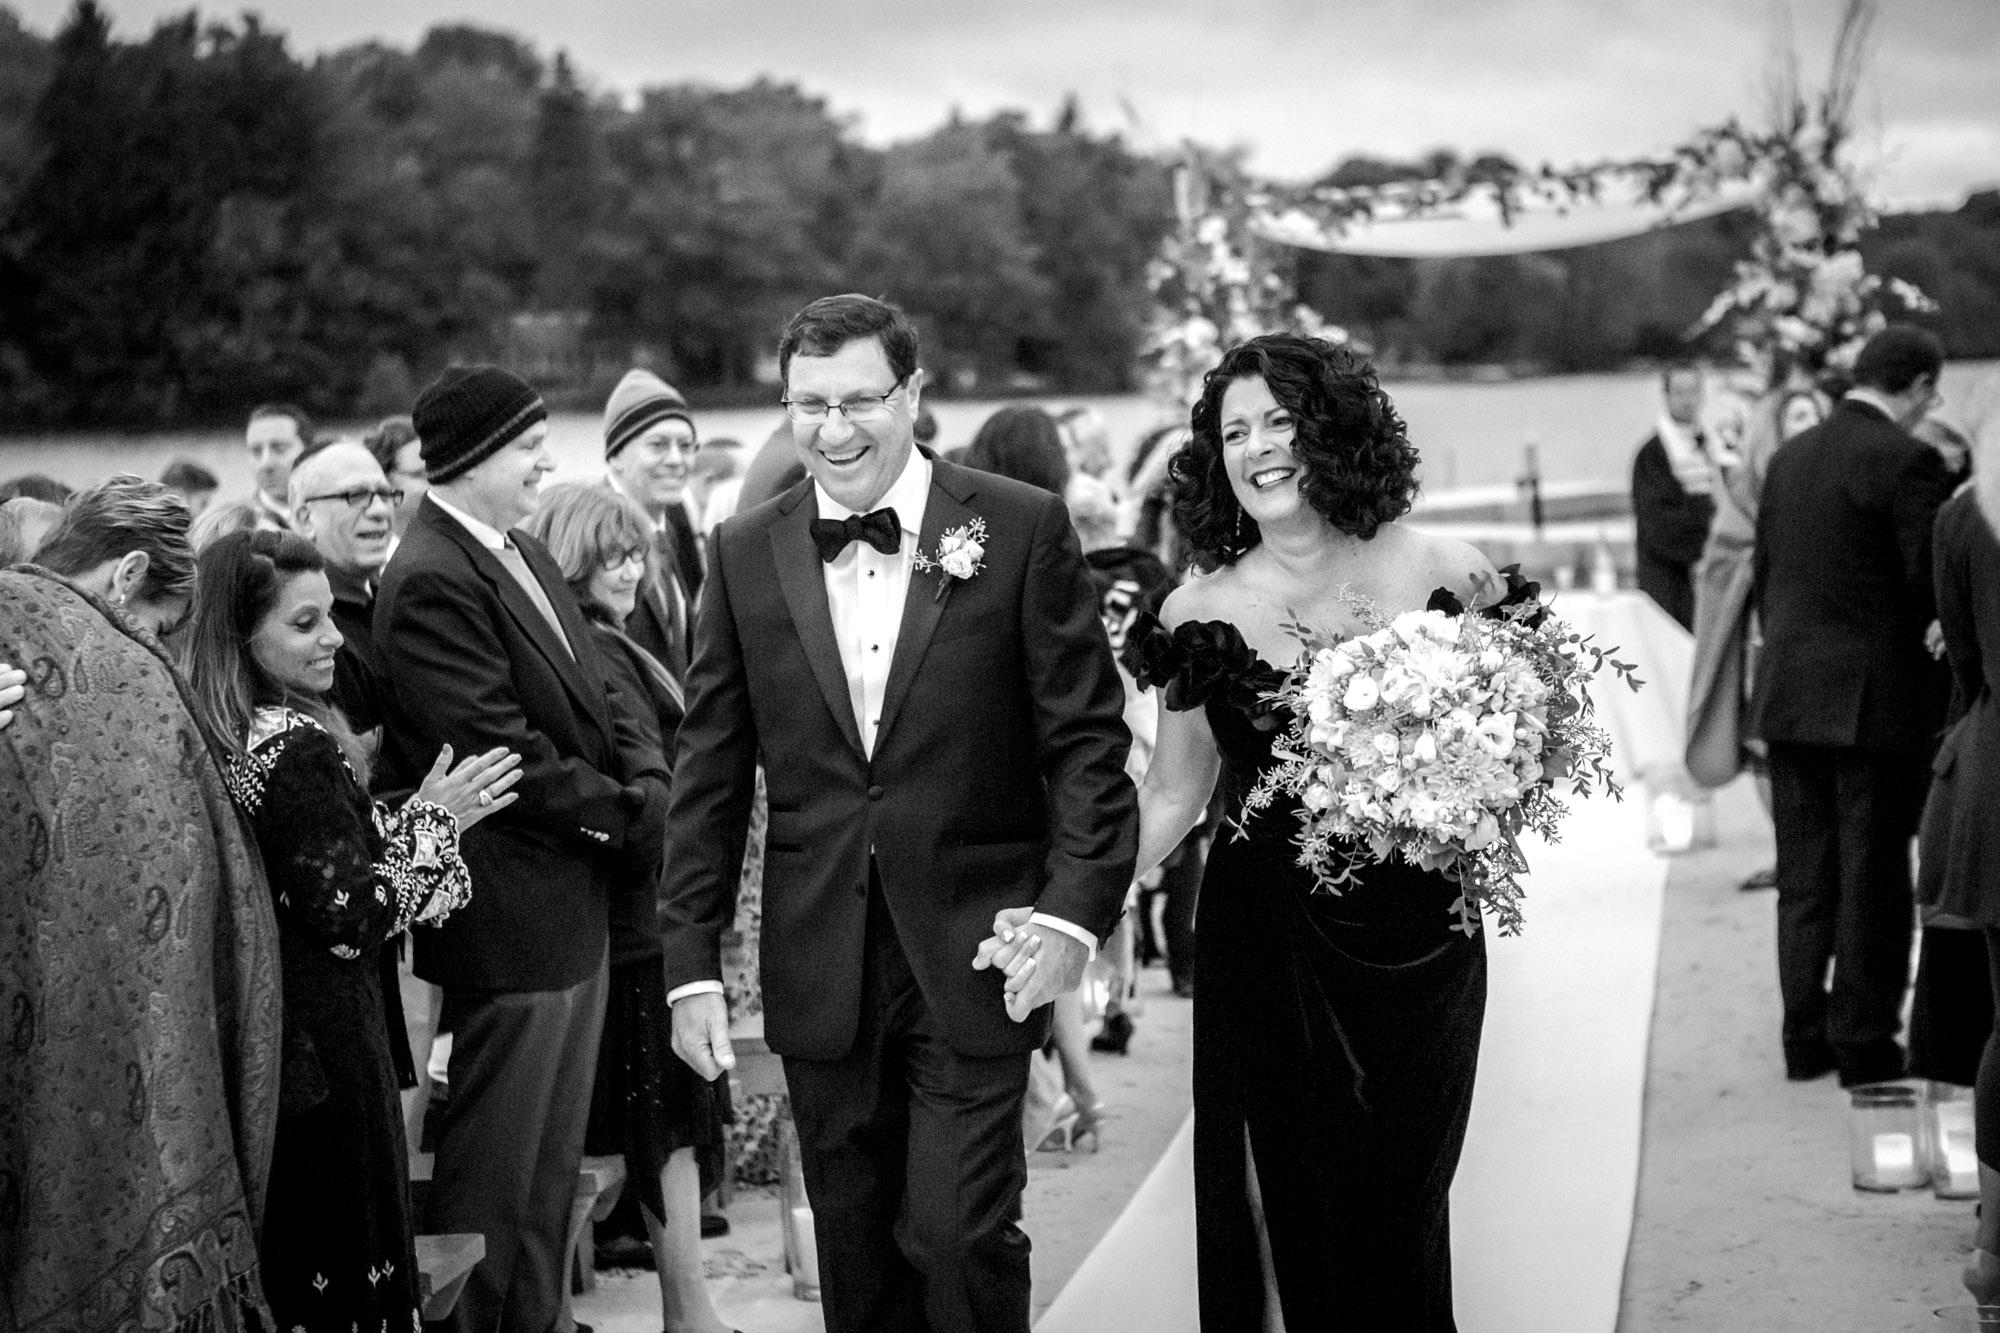 scranton_wedding_photographer_lettieri_pa (30 of 34).jpg